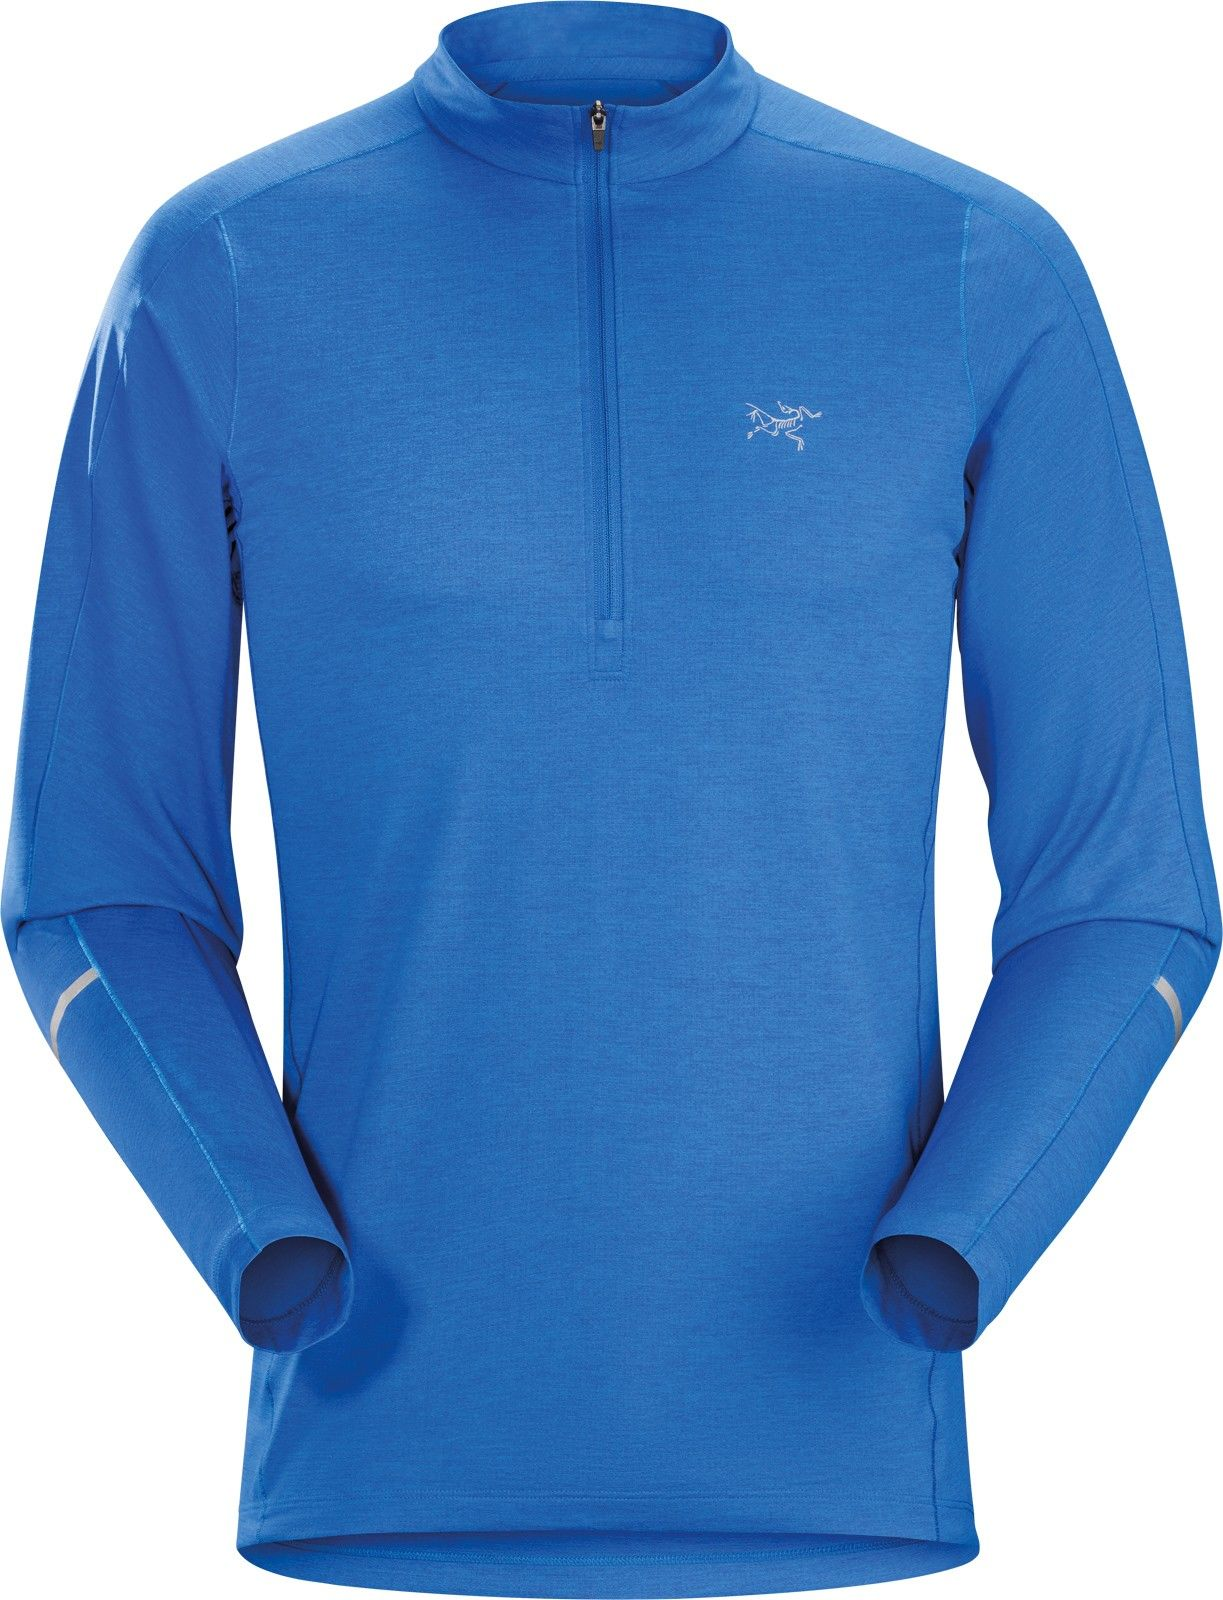 Arcteryx M Cormac Zip Neck Long-Sleeve | Größe S,M,L,XL | Herren Langarm-Shirt